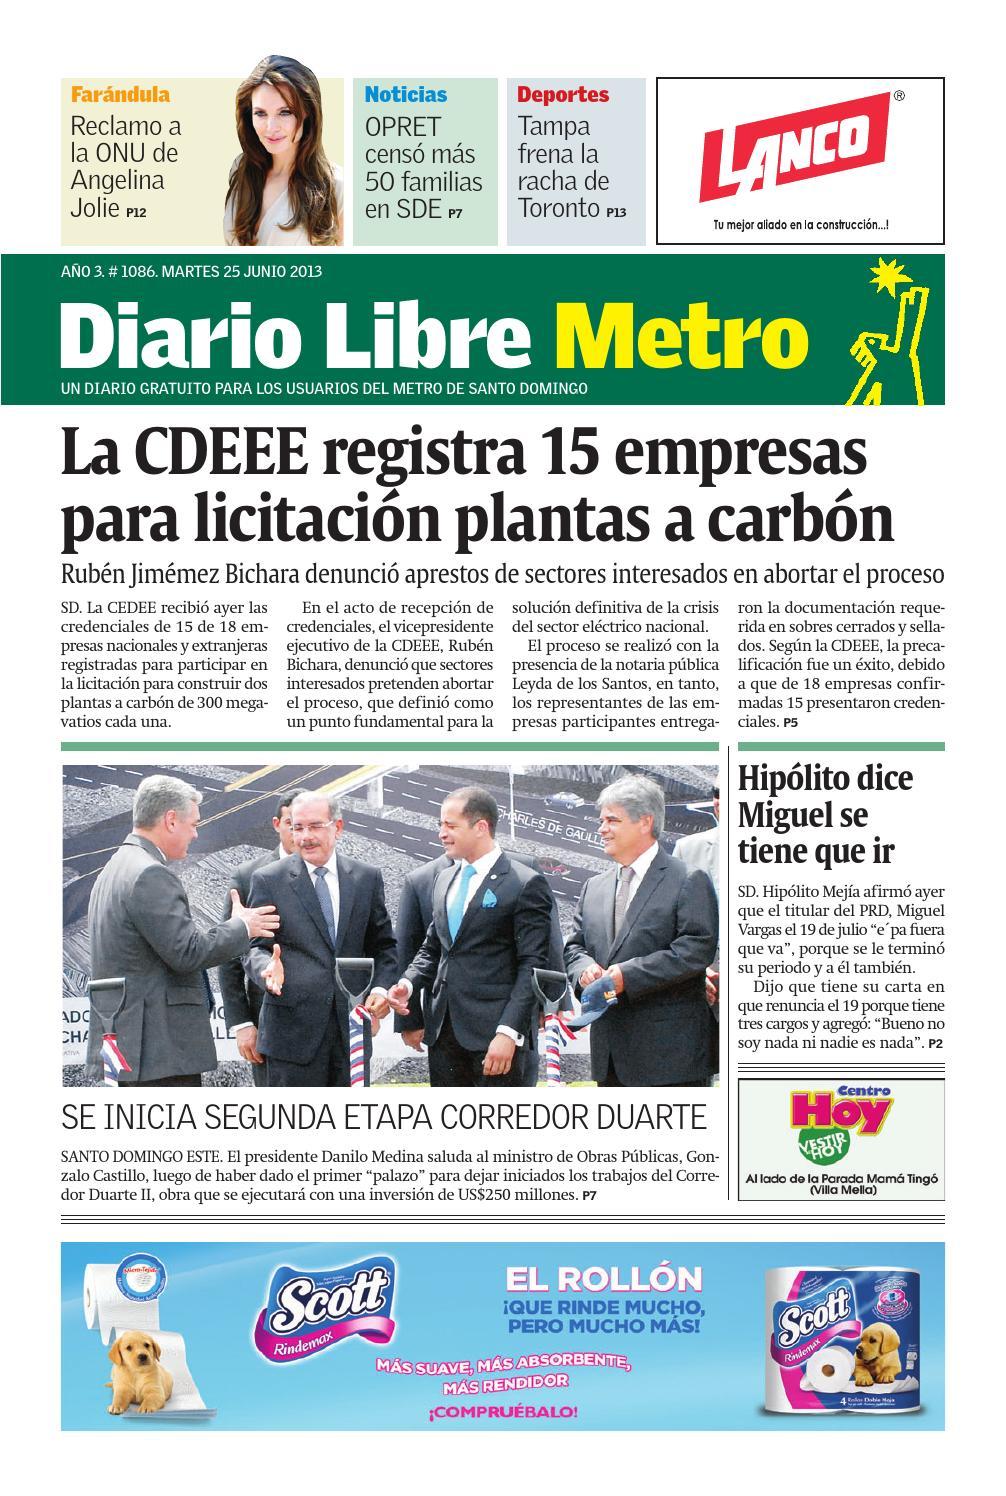 Diariolibremetro1086 by Grupo Diario Libre, S. A. - issuu